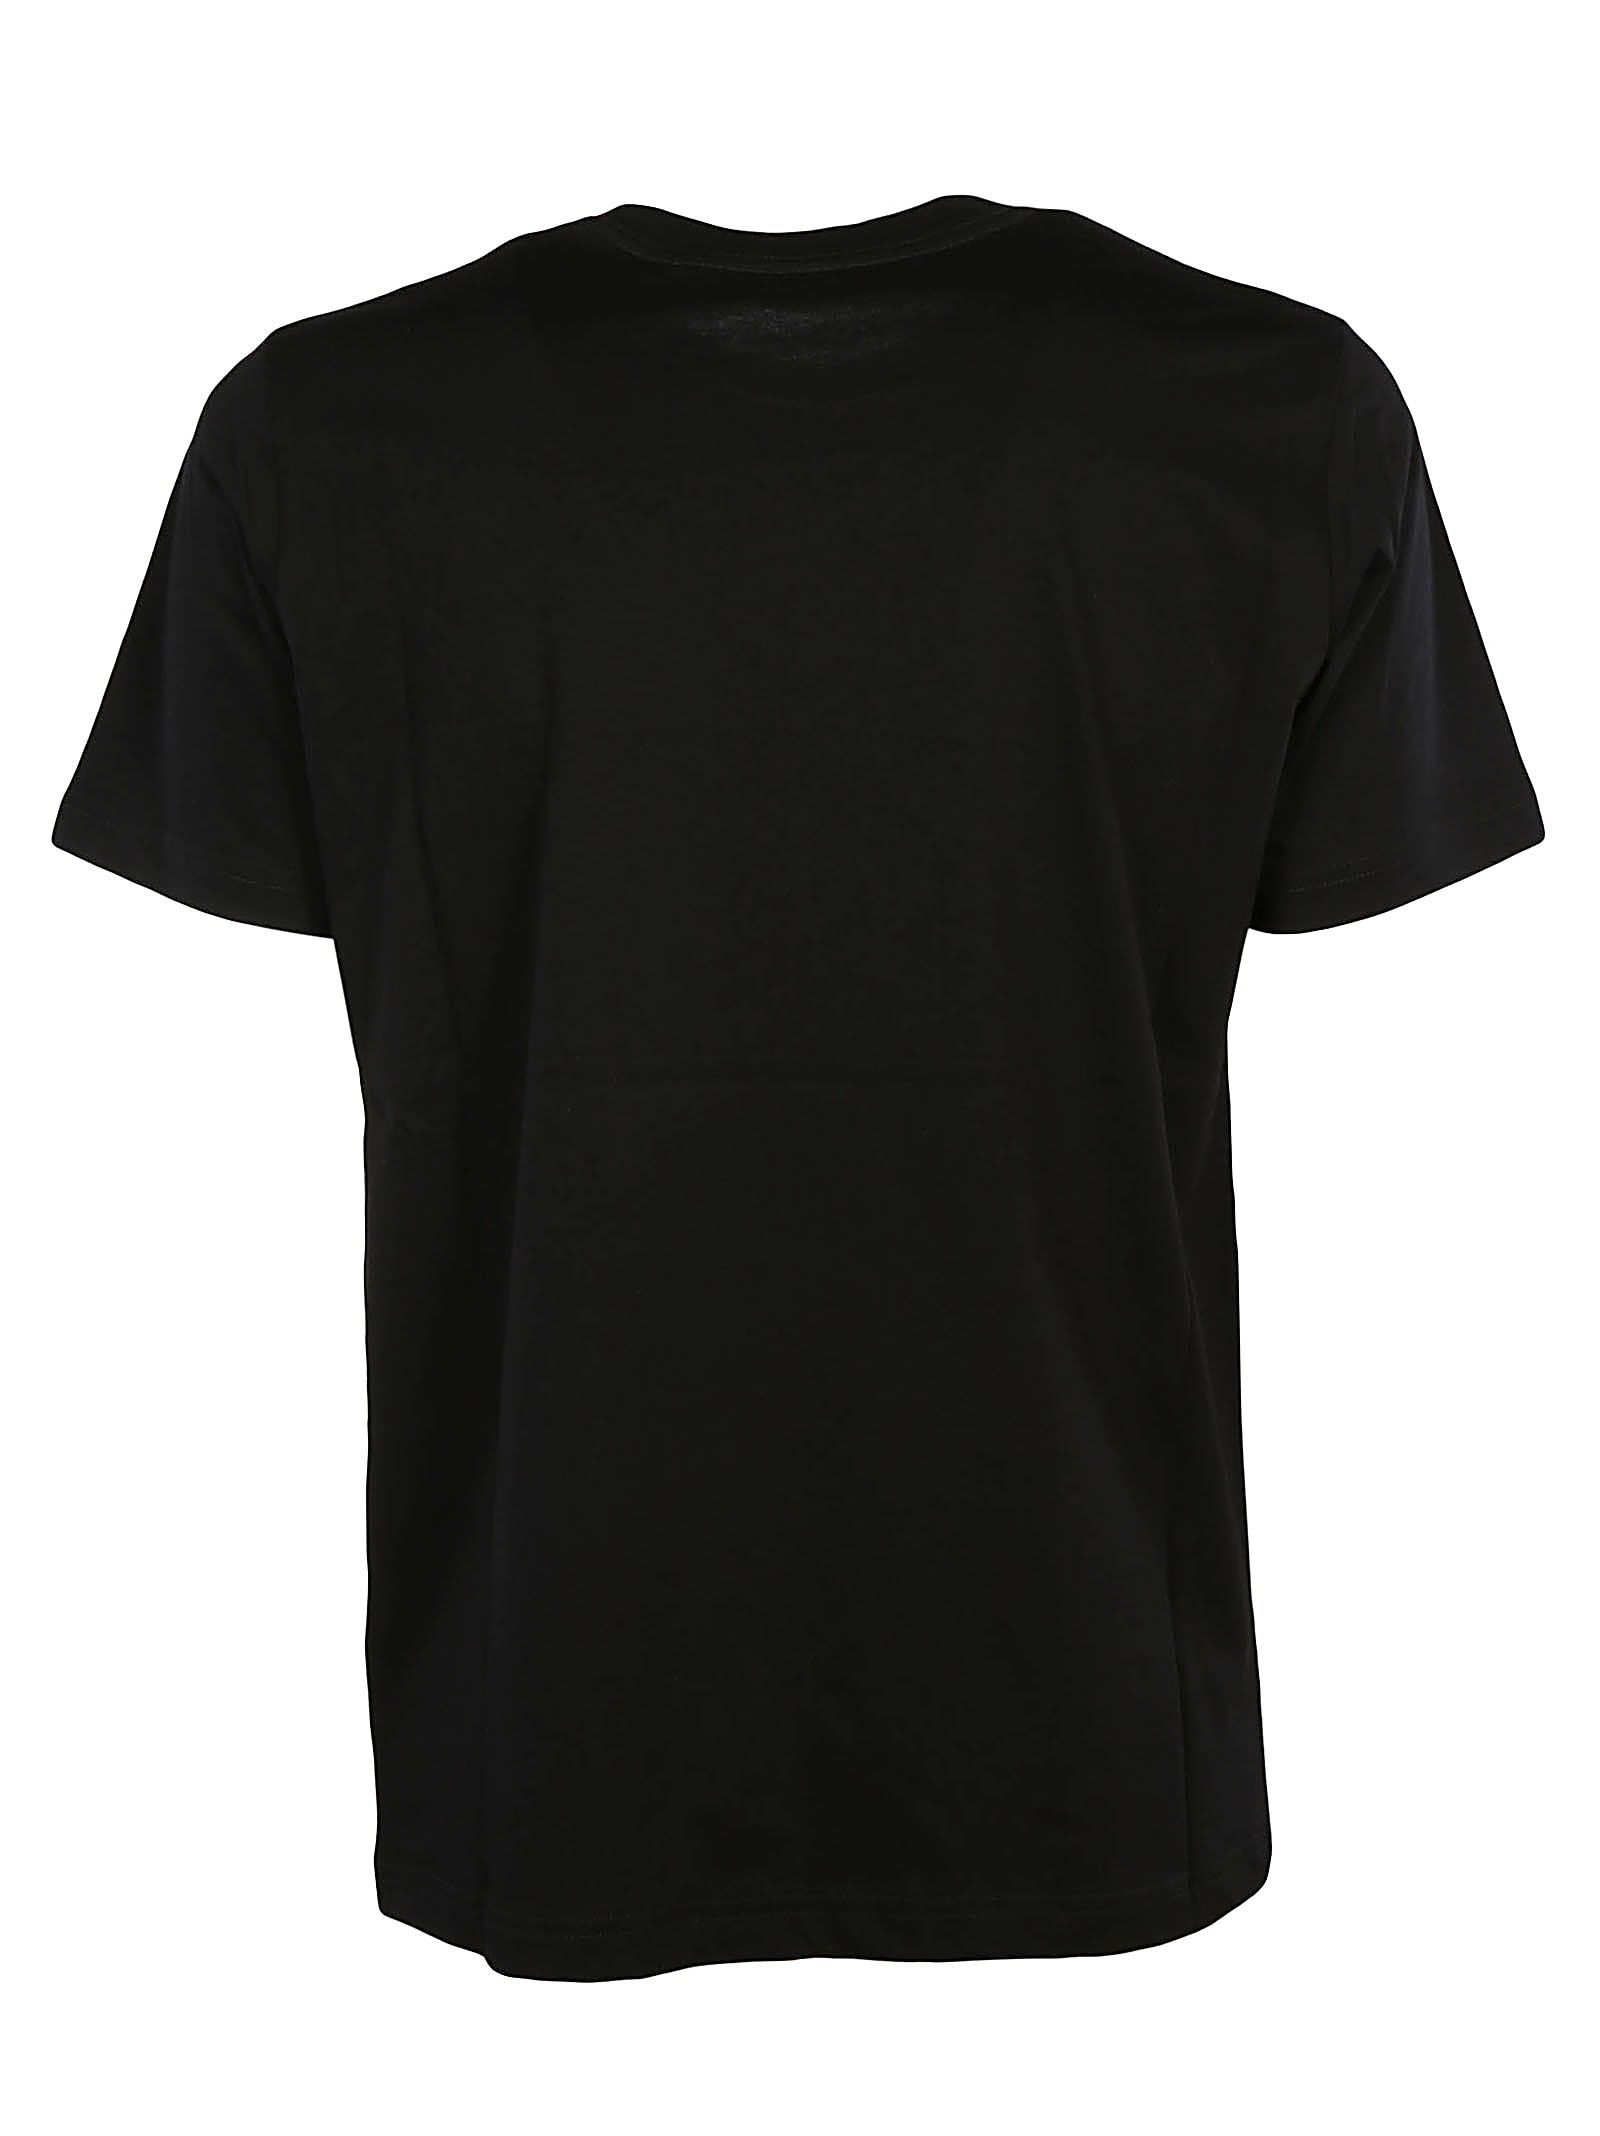 Diesel shirts logo